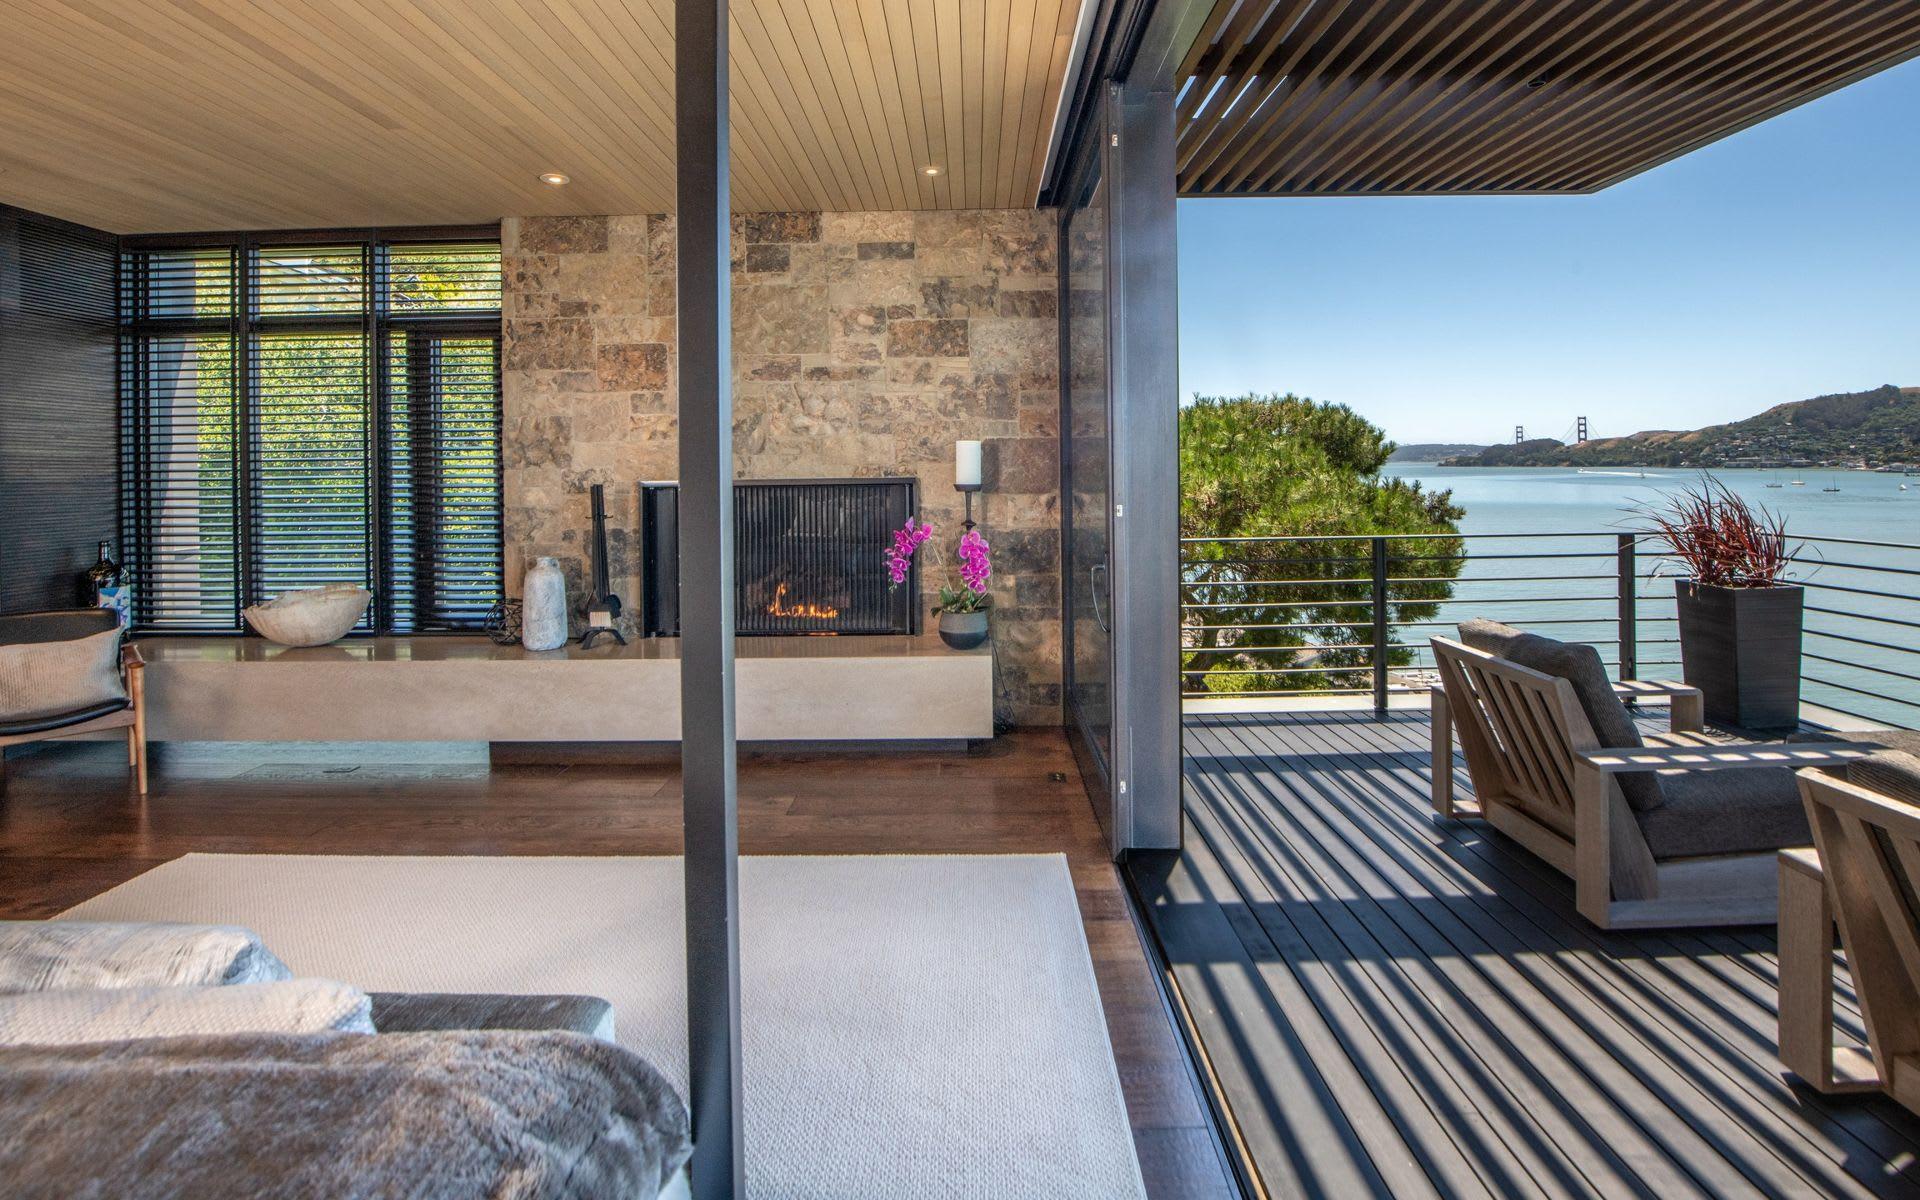 Venture Capitalist Todd Chaffee Puts His $24.5 Million Island Mansion on the Market